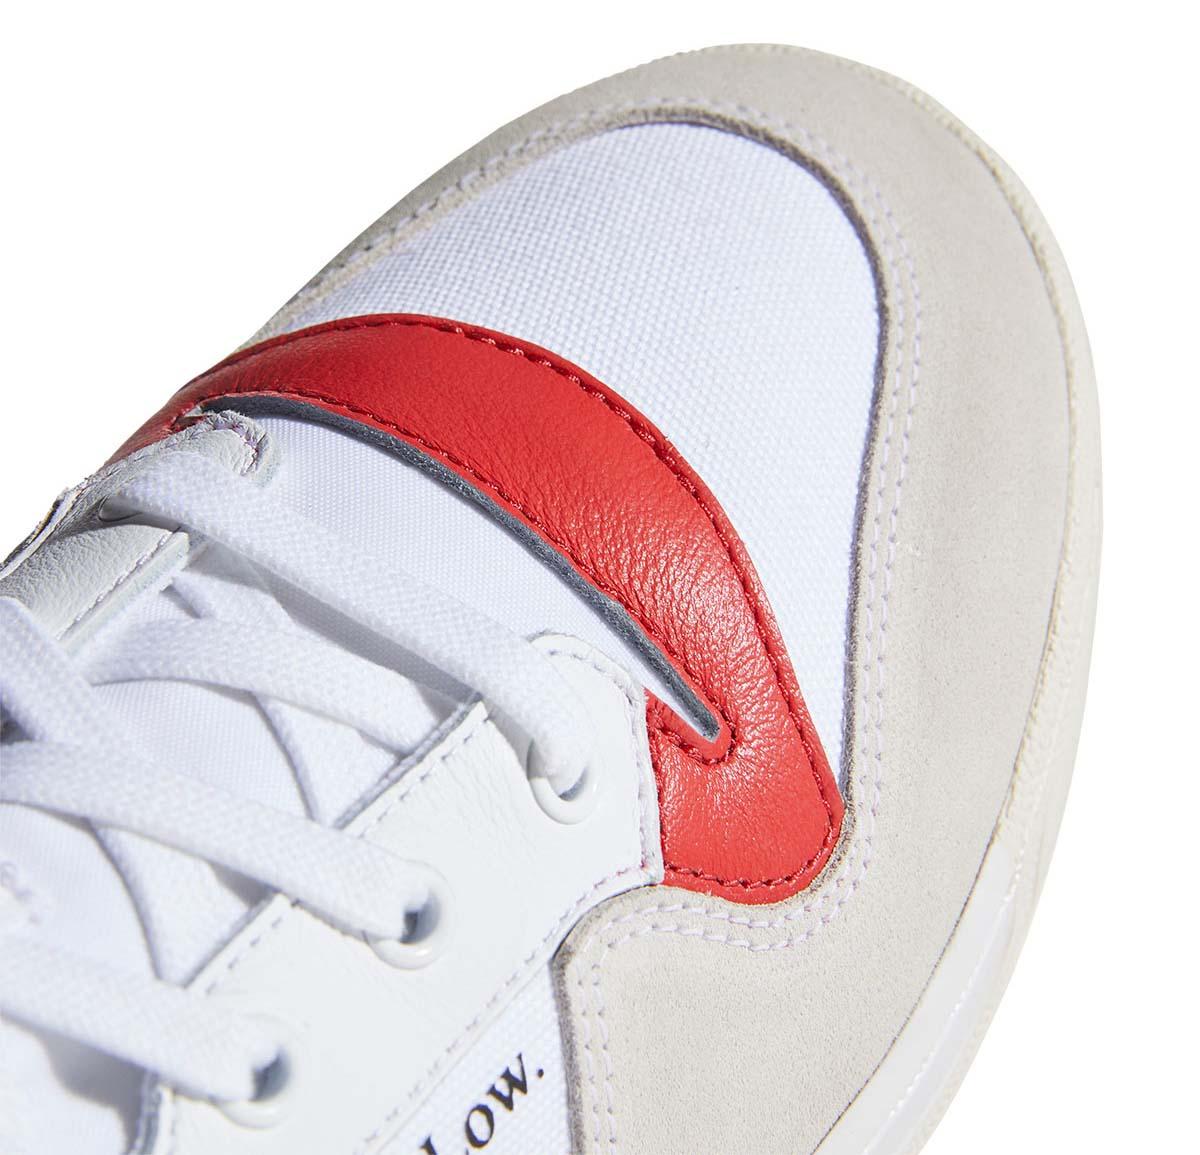 adidas RIVALRY LOW FOOTWEAR WHITE / CHORK WHITE / GLORY RED EF6418 アディダス ライバルリー ロー ホワイト/レッド/グレー